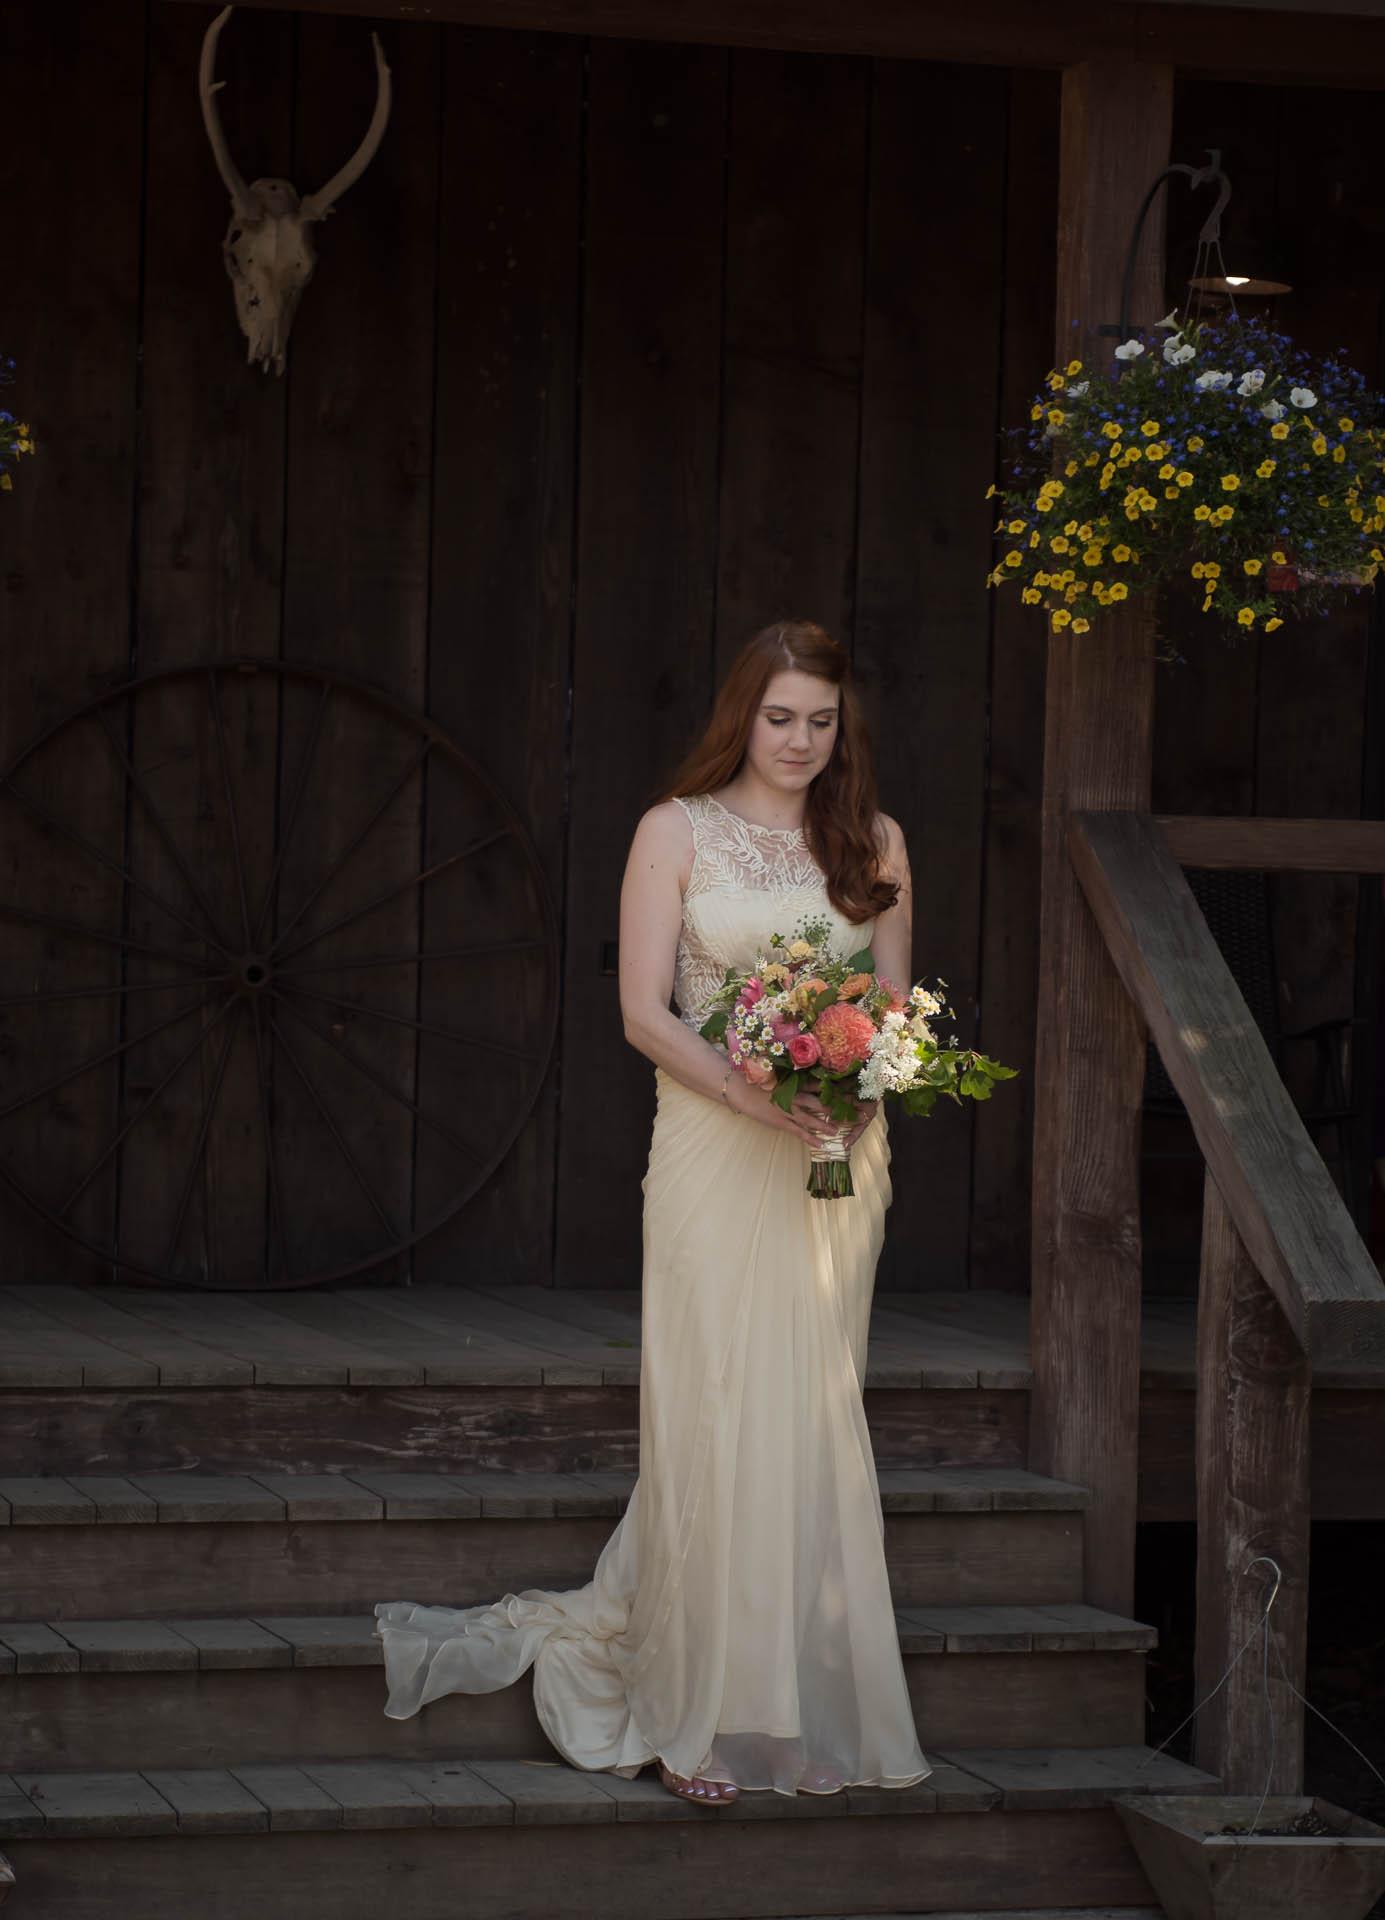 Willie Greens Organic Farm Wedding Jon Amp Andrea Amber Tolbert